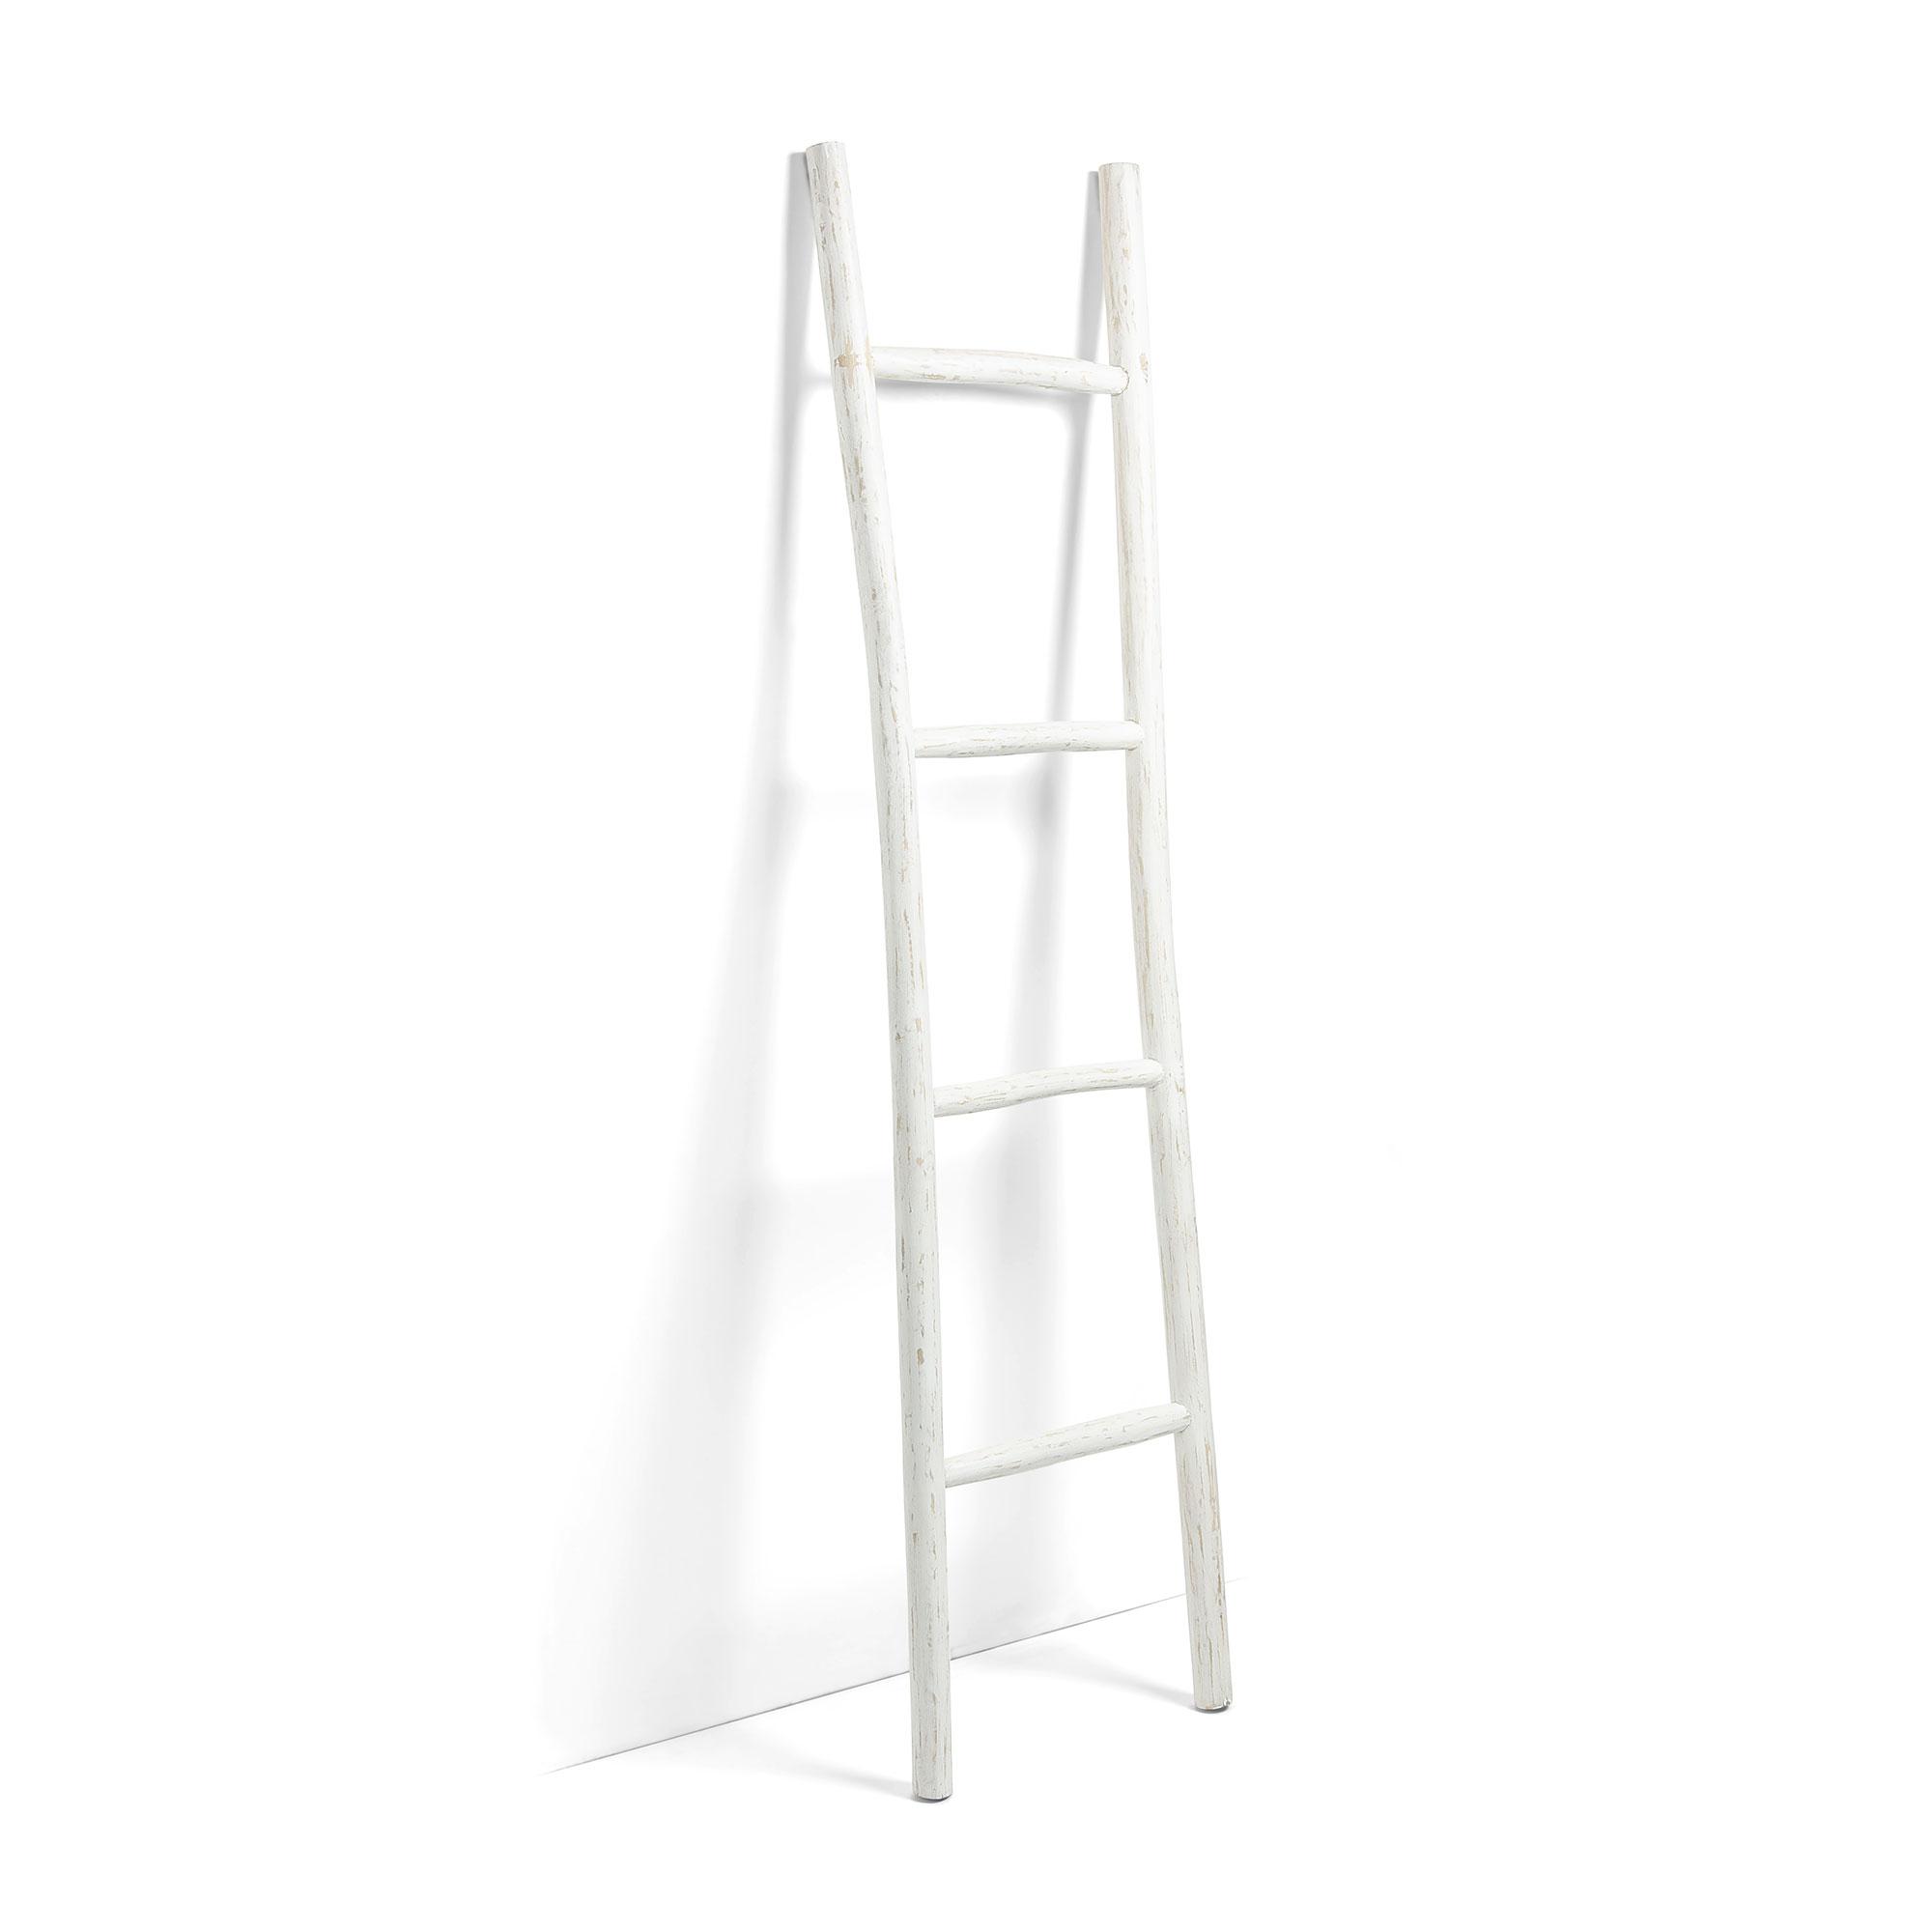 Kave Home Decoratie ladder 'Marge' Teak 190cm, kleur Wit